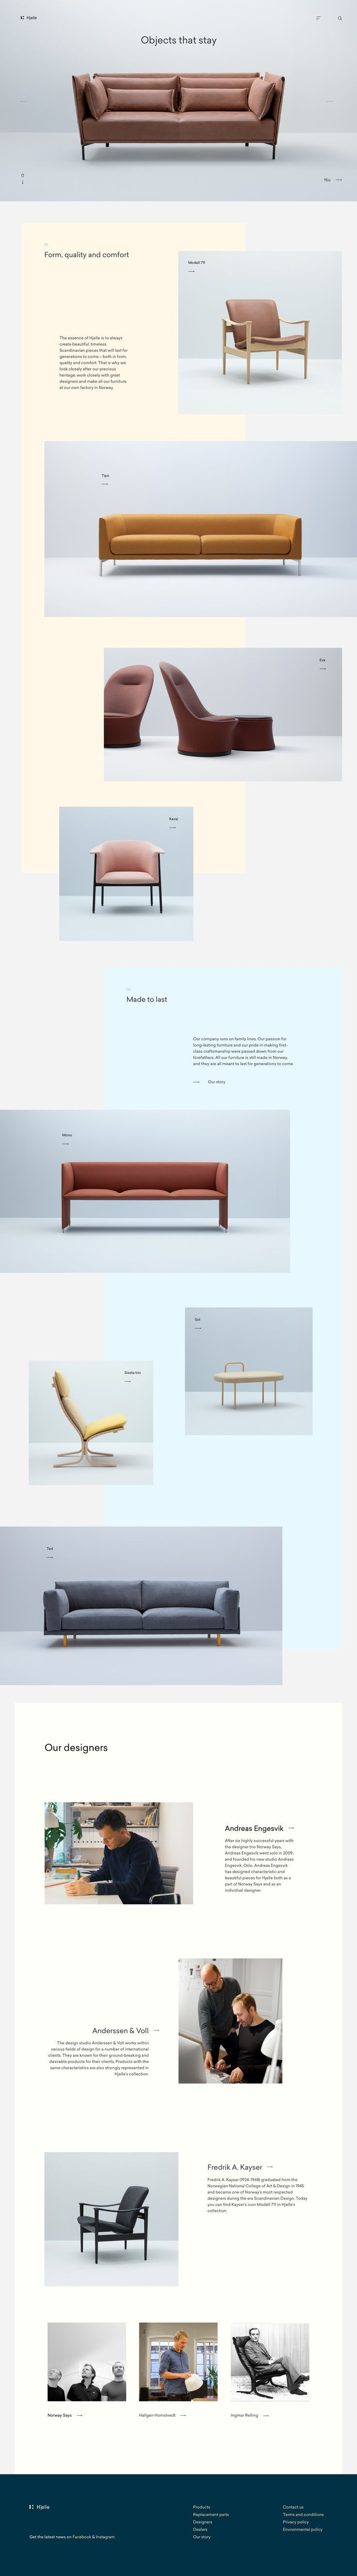 112 best Furniture & Decor images on Pinterest